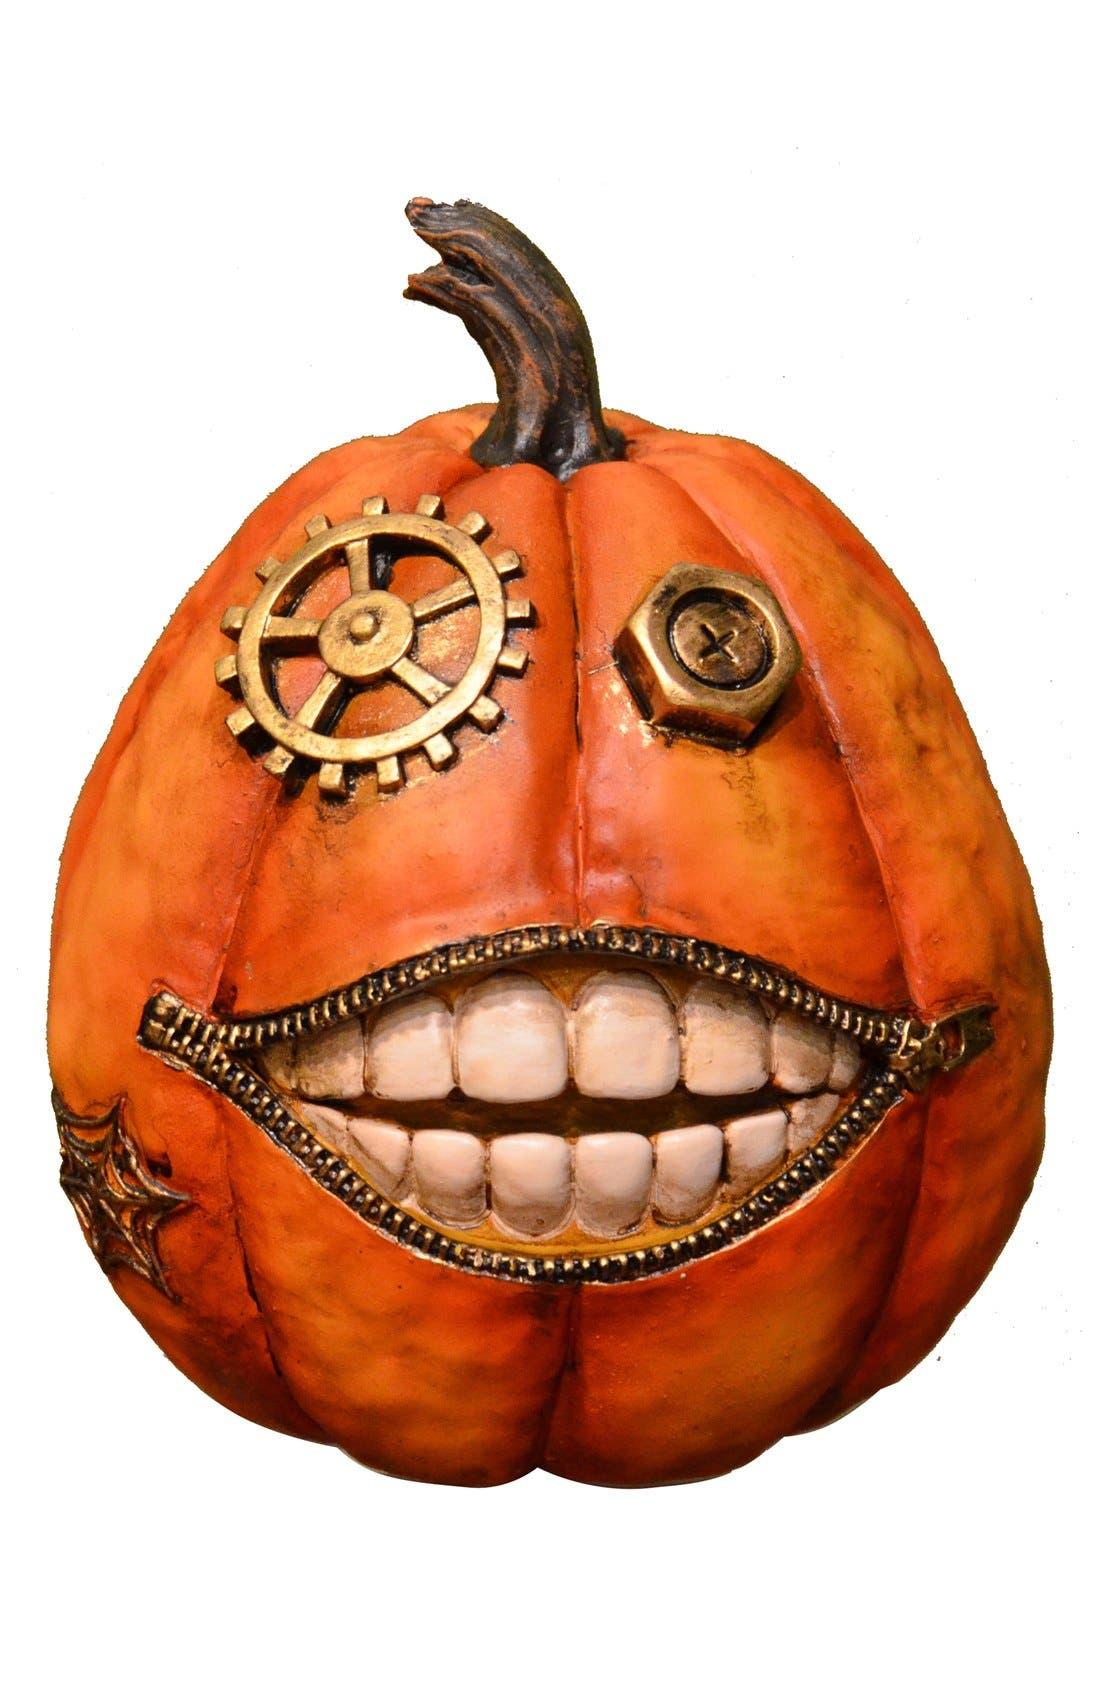 Alternate Image 1 Selected - Fantastic Craft 'Steam Pumpkin' Figurine